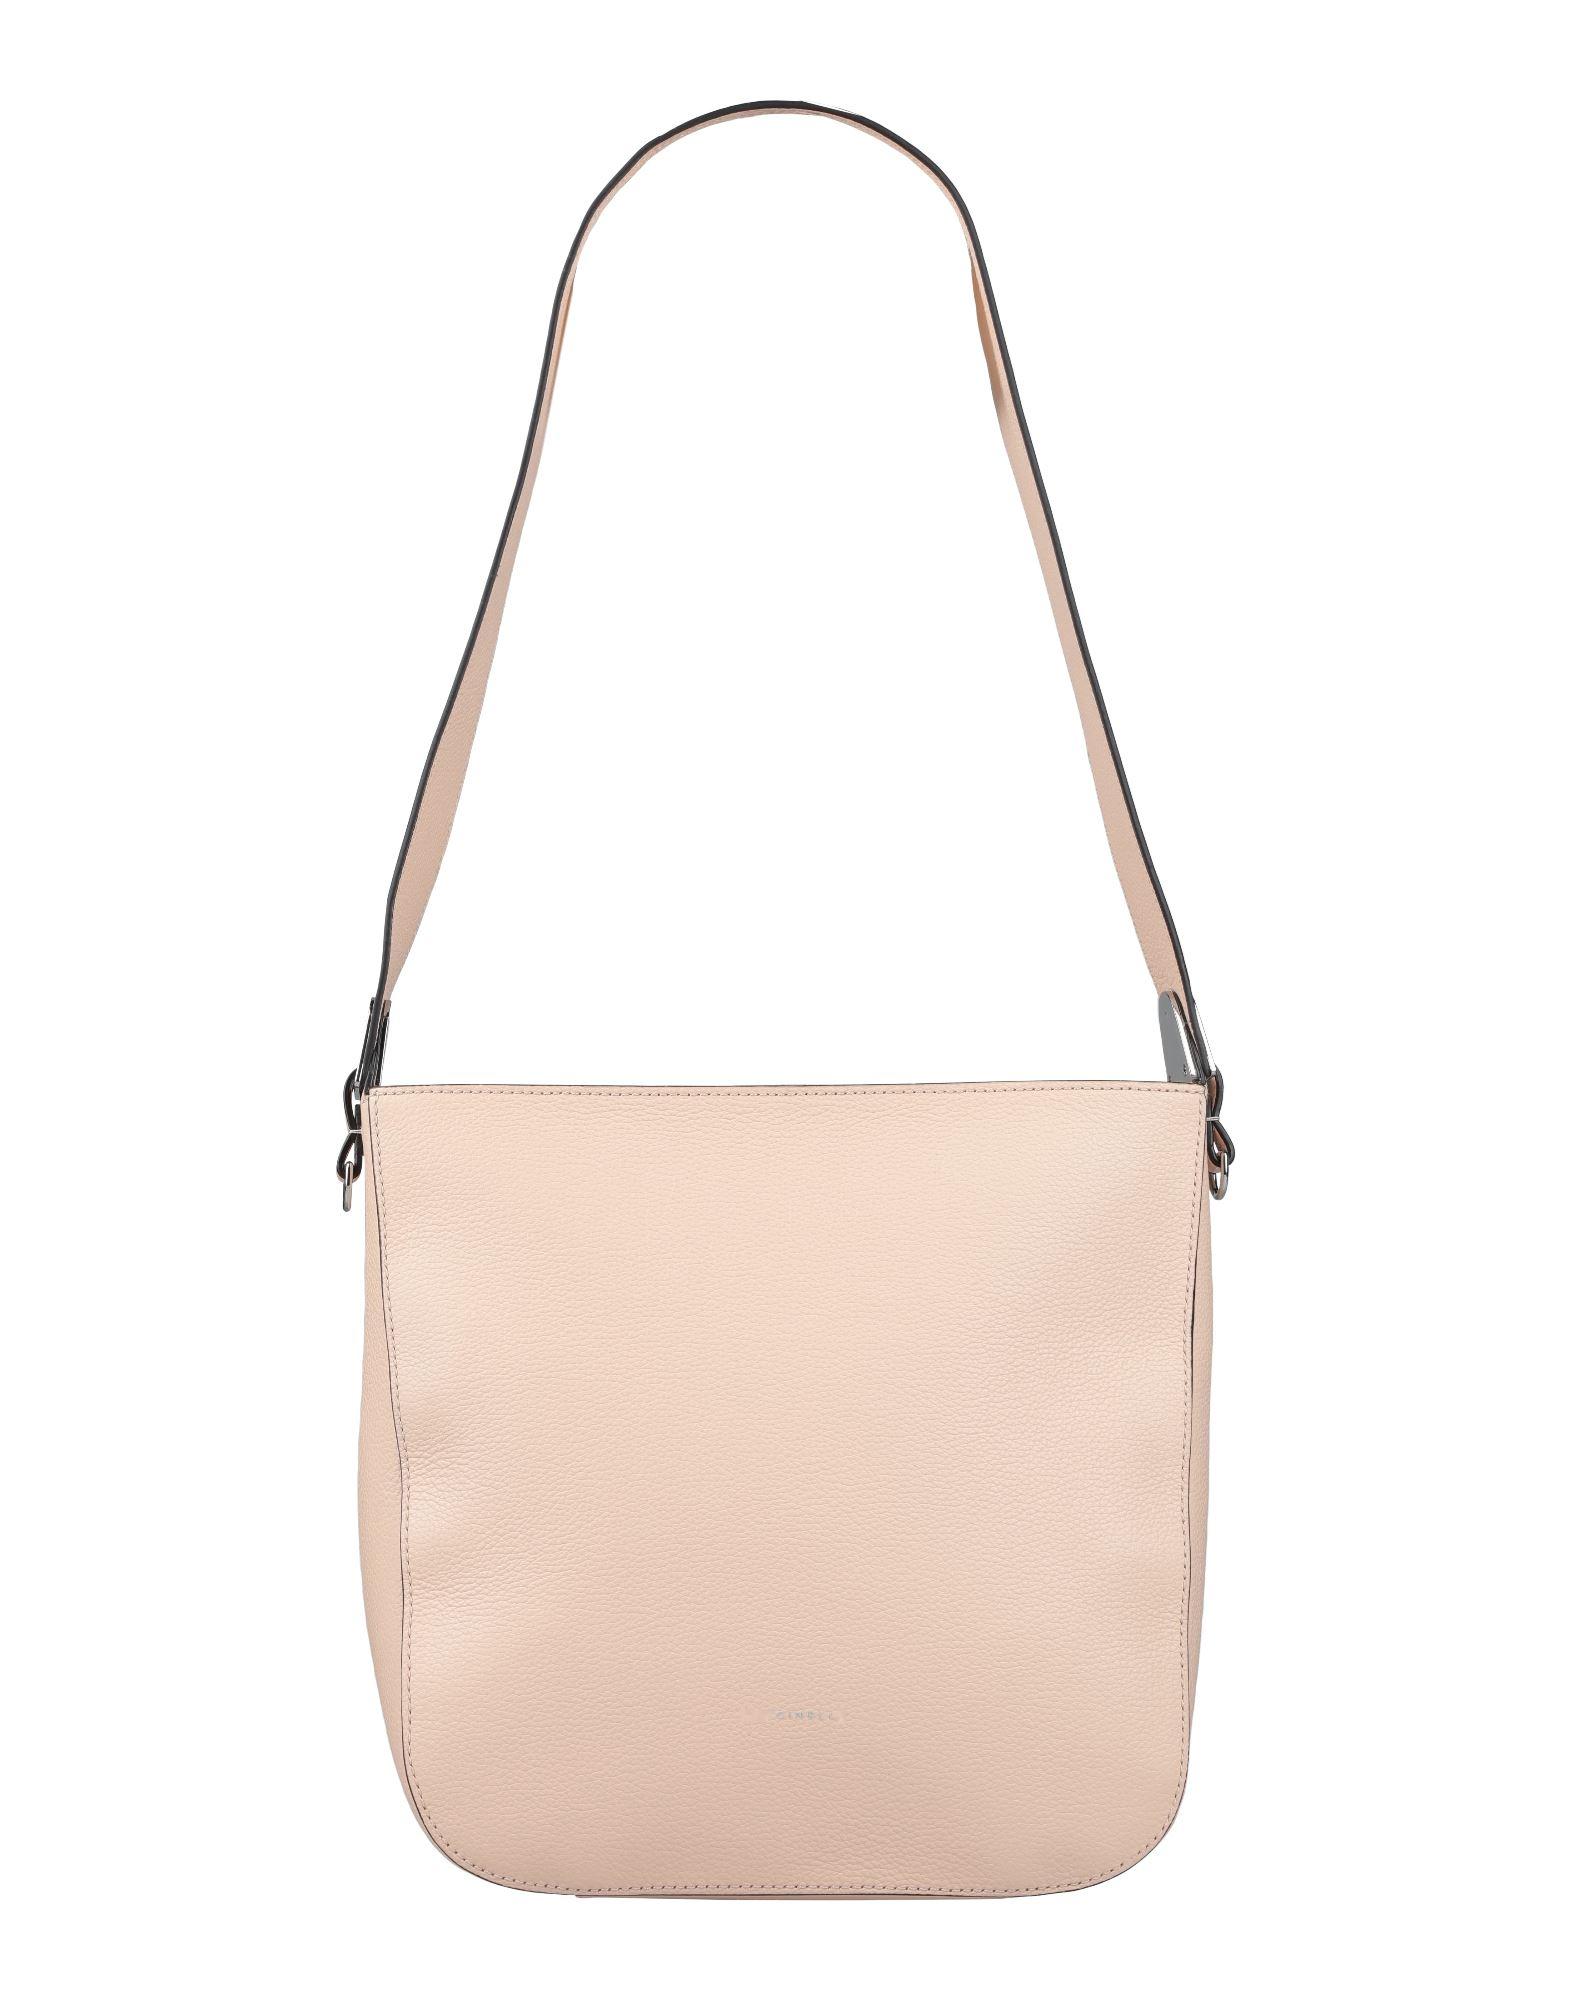 COCCINELLE Shoulder bags - Item 45568134